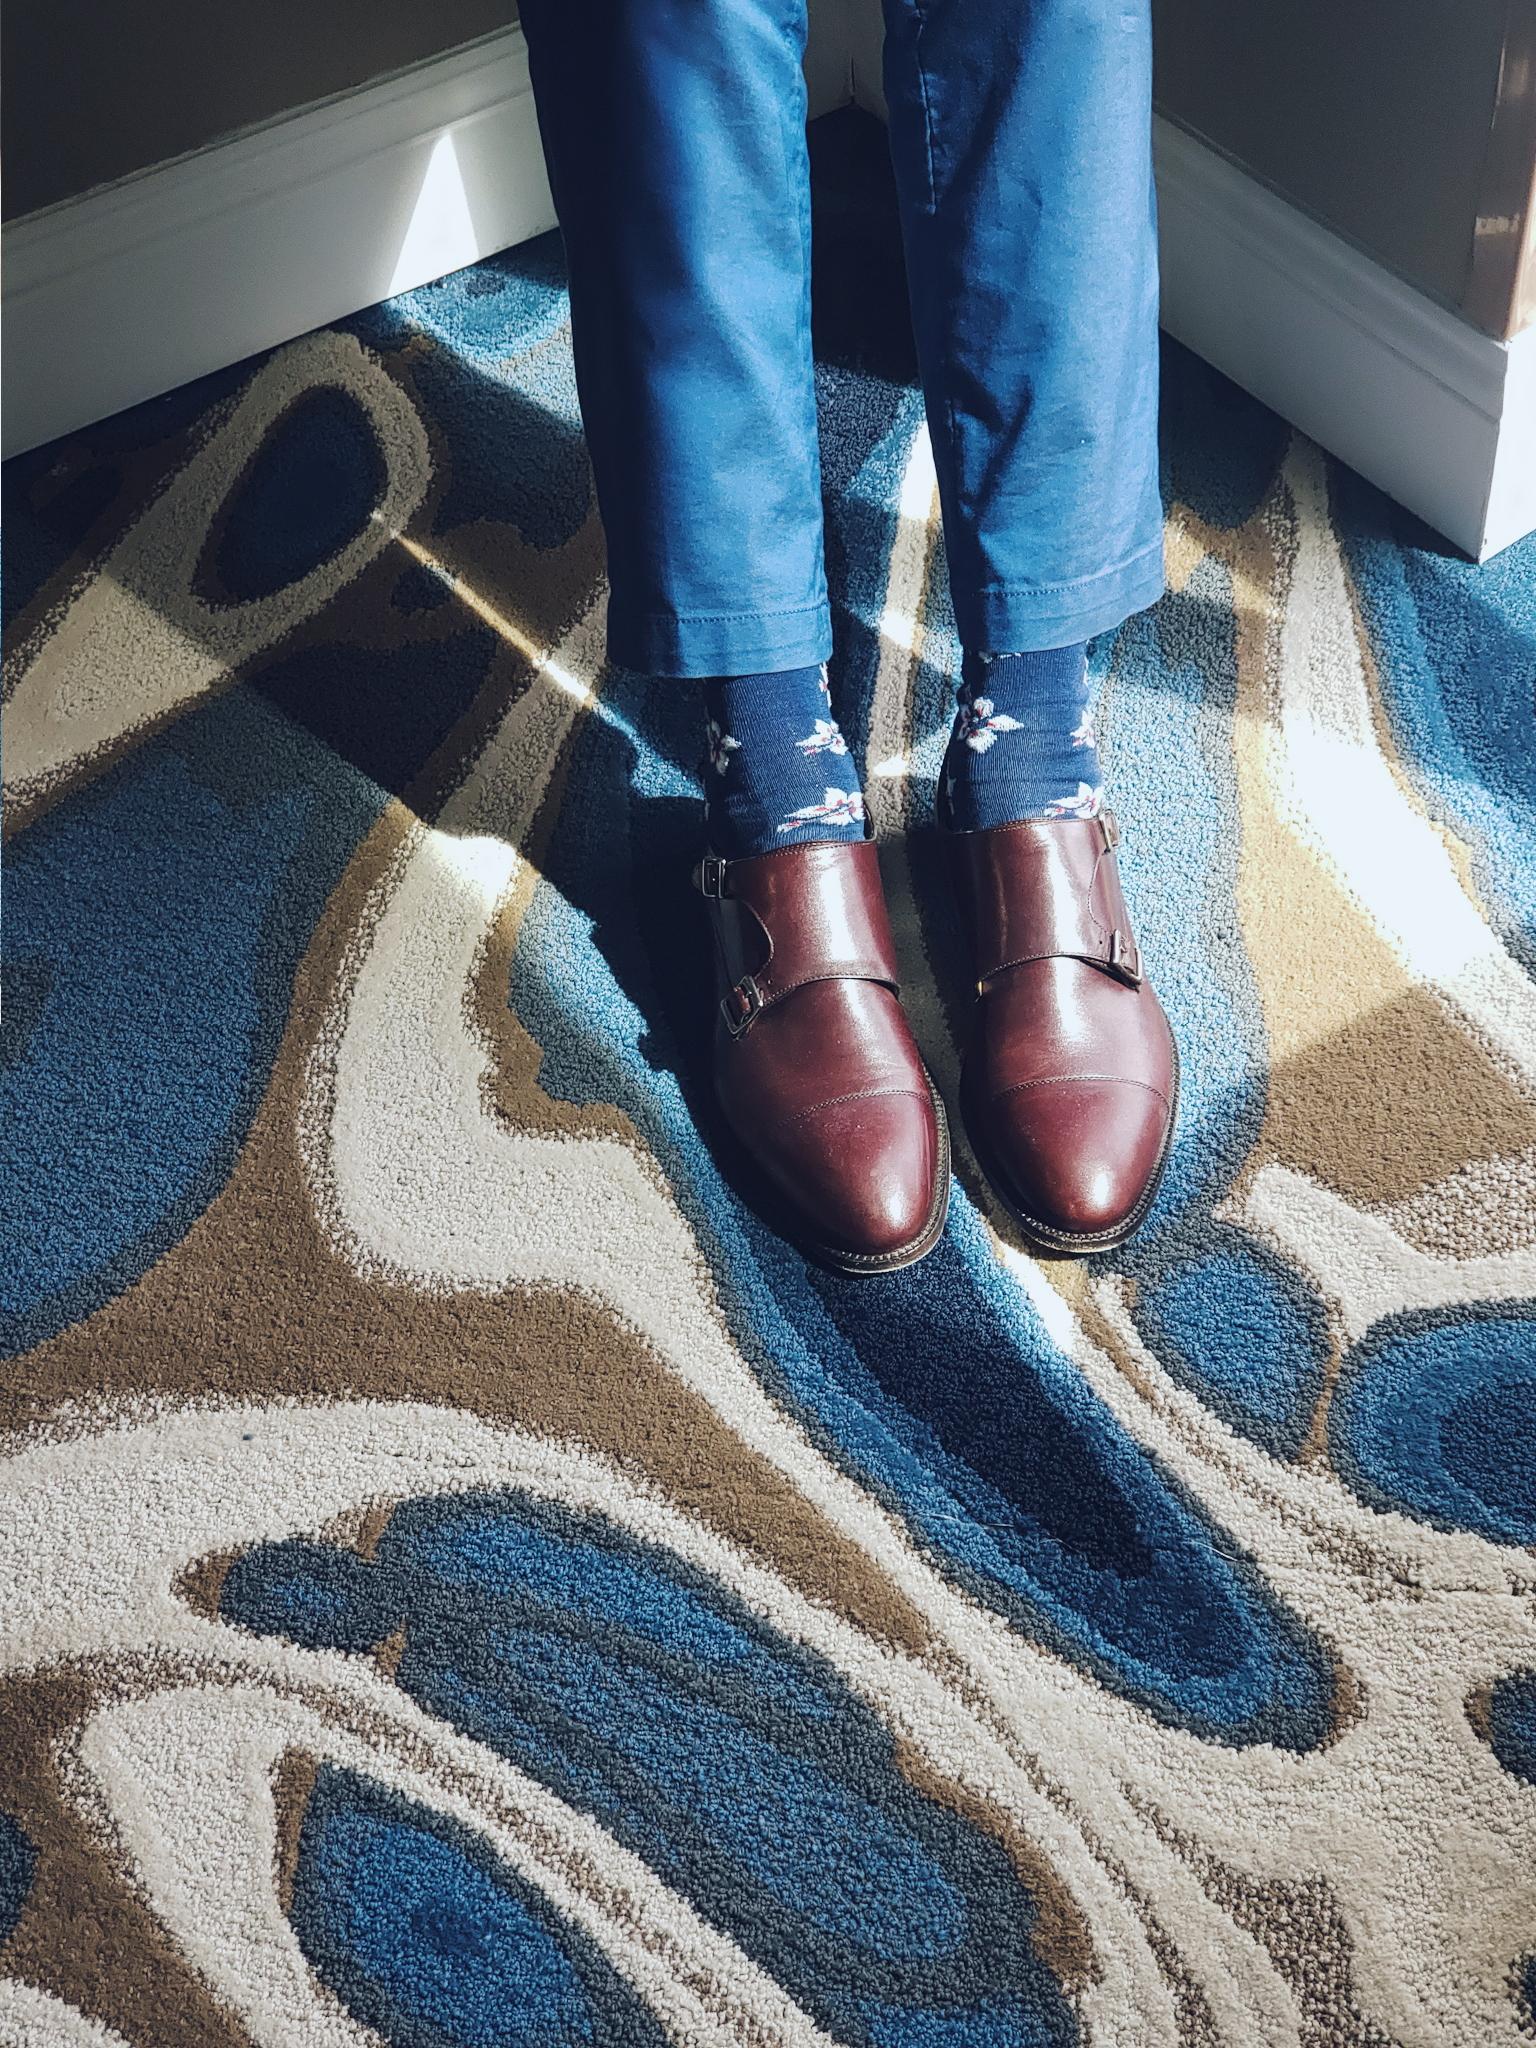 Beckett Simonon Shoes and Bugatchi Socks